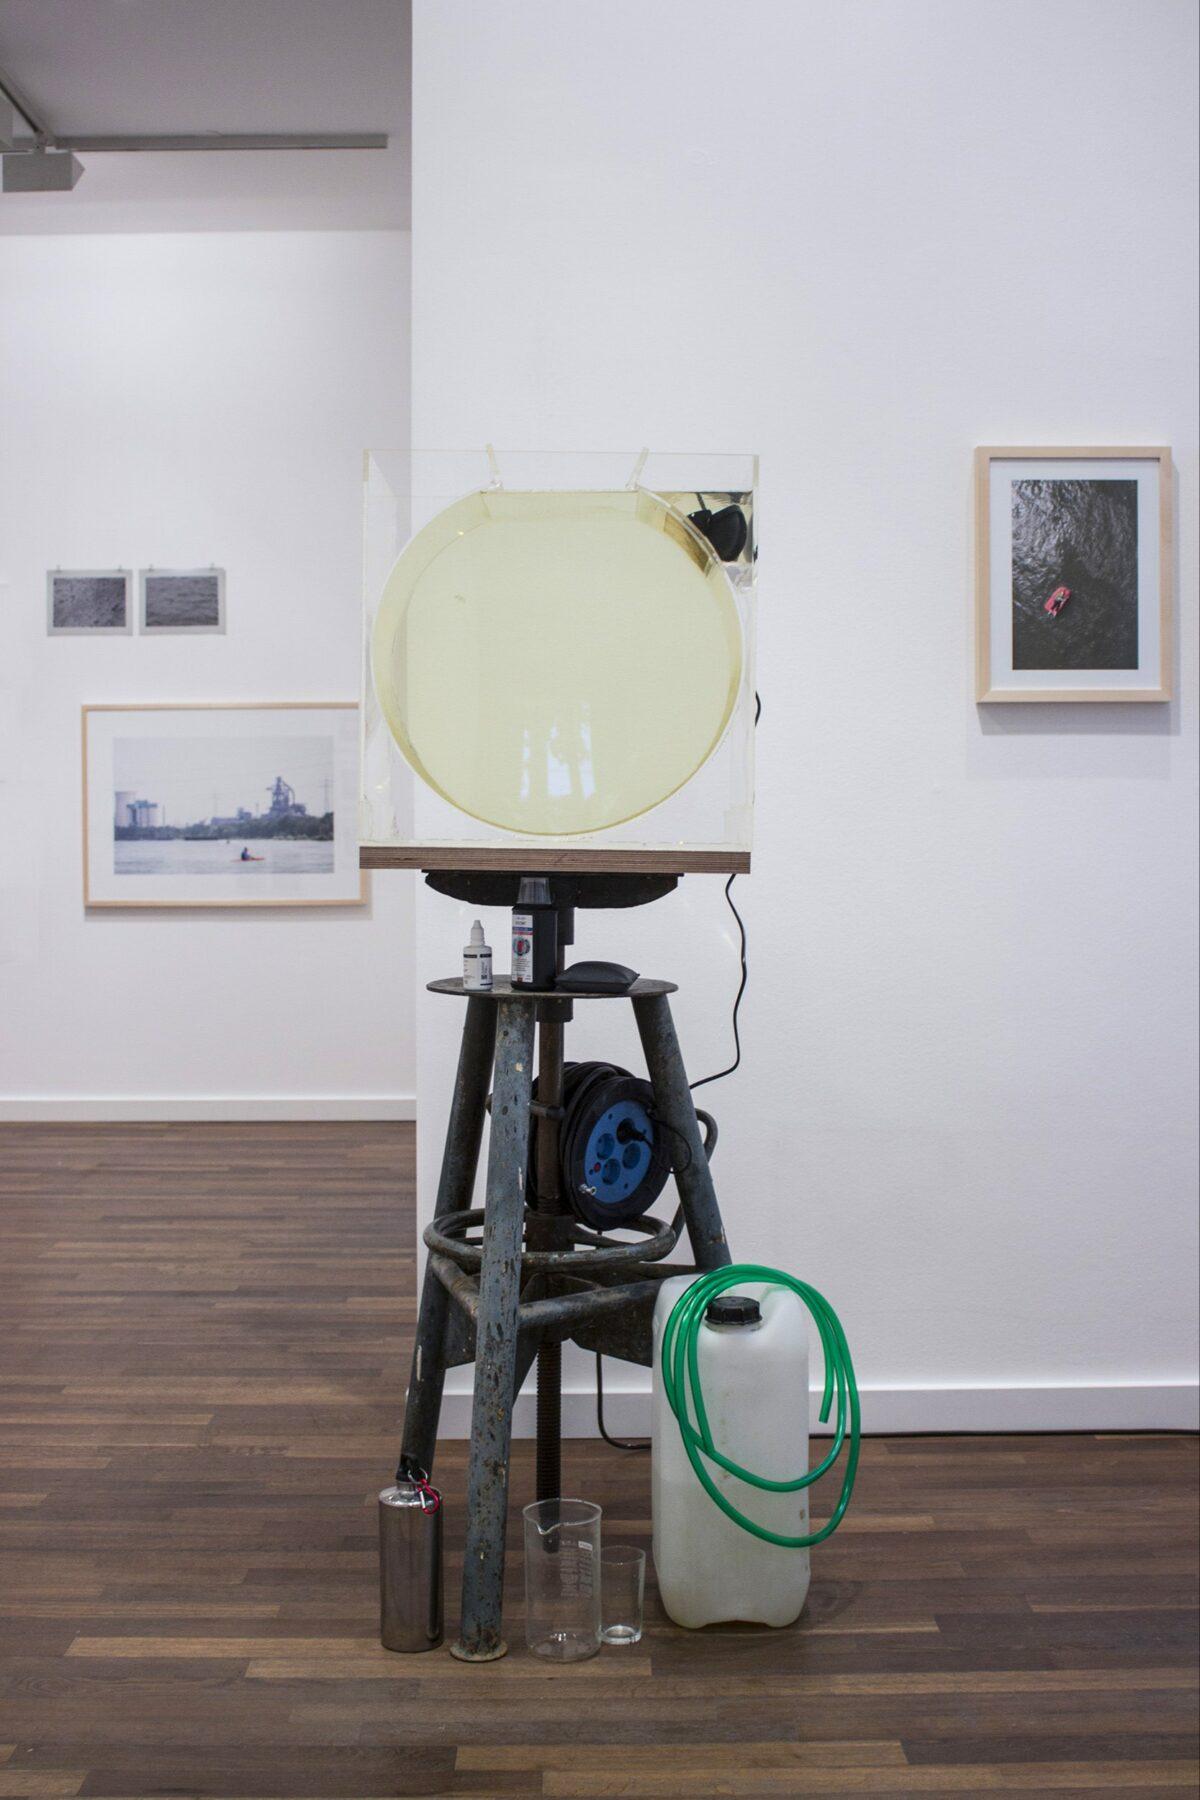 Medusa : floating body #2, exhibition view, living medusa, Galerie Crone Berlin, 2019